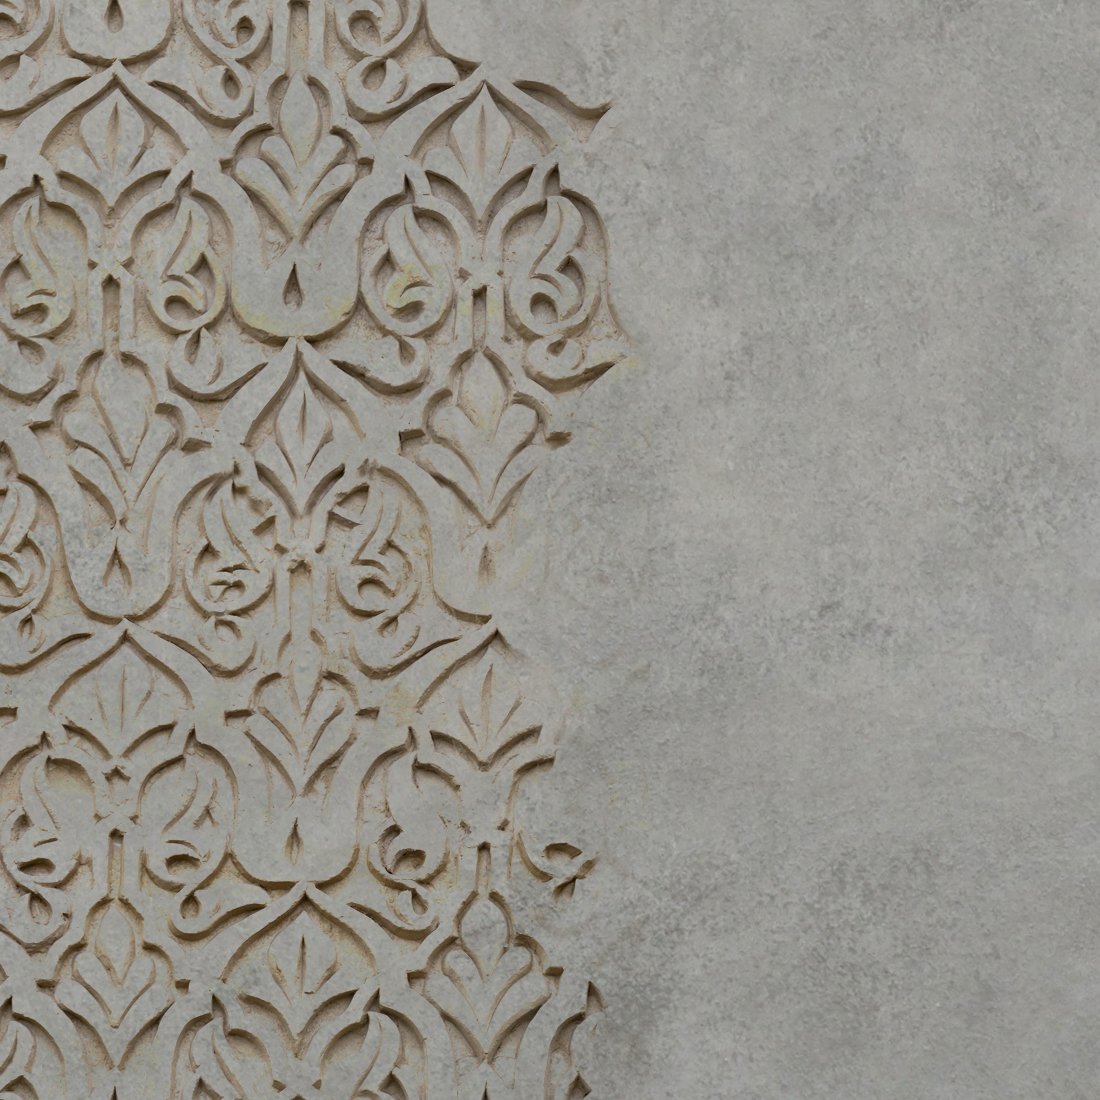 behangfabriek detail oude muur stuc ornament